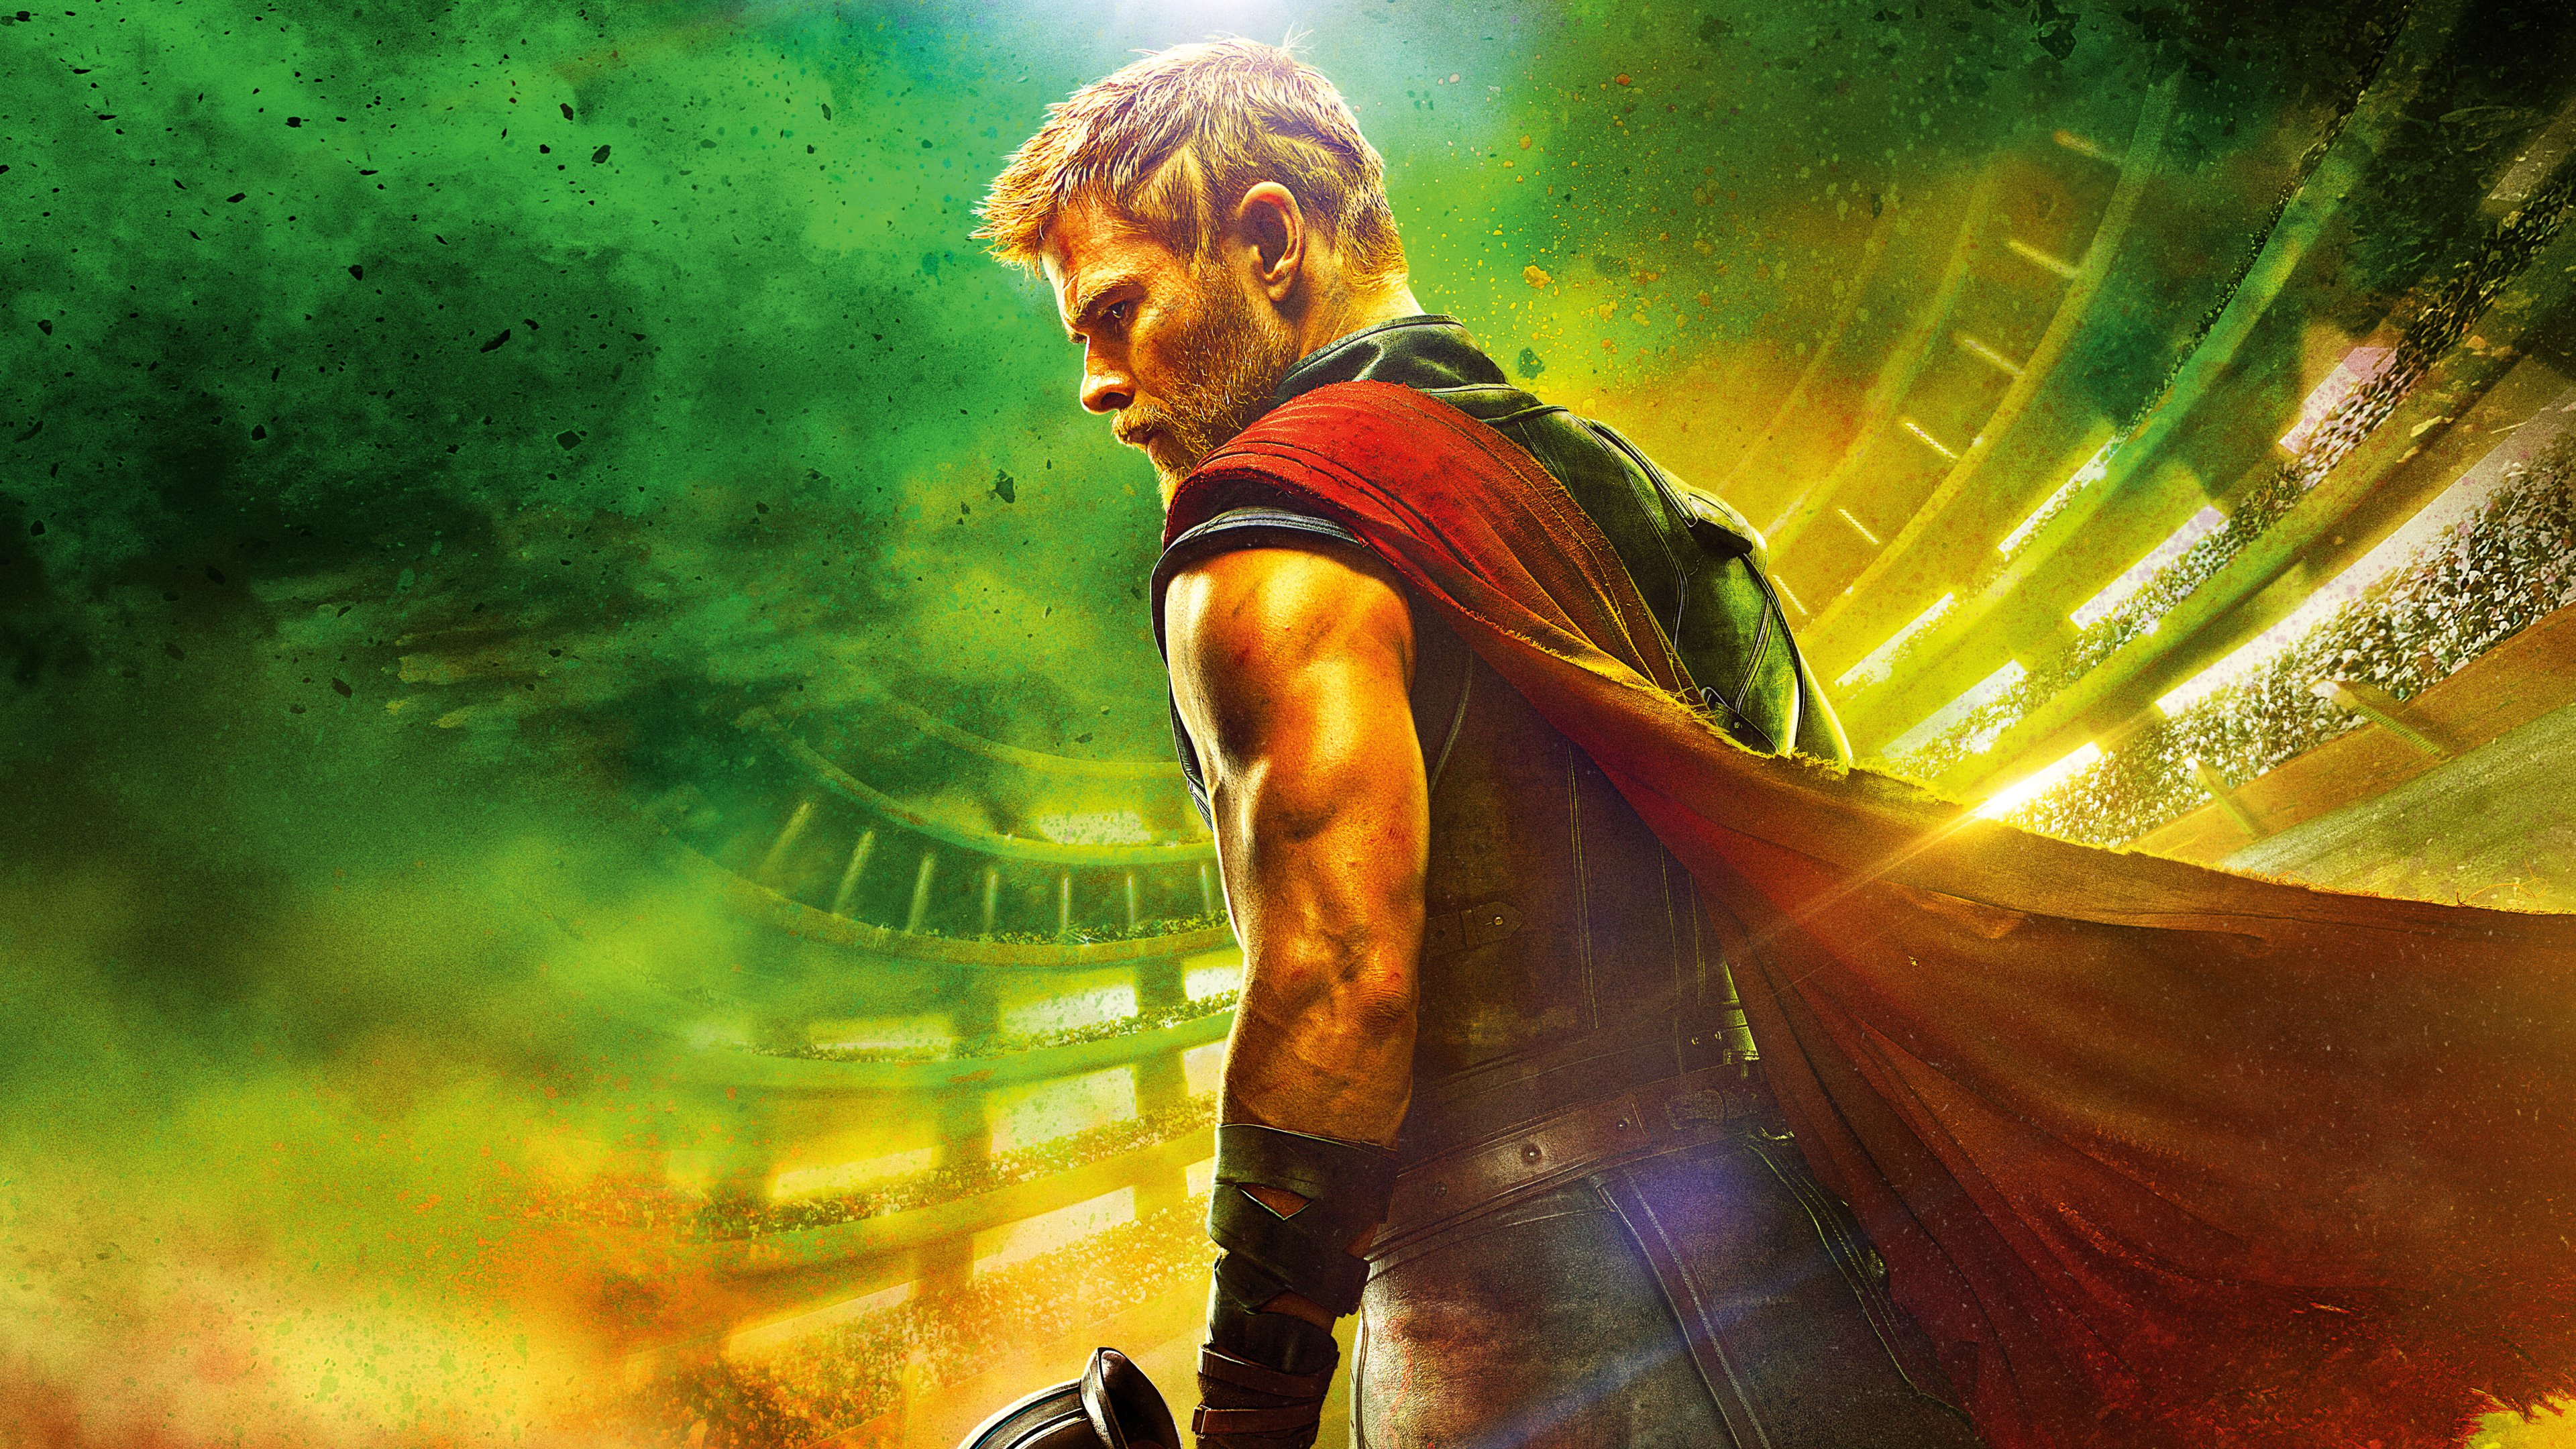 Thor Ragnarok Soundtrack Music Complete Song List Tunefind